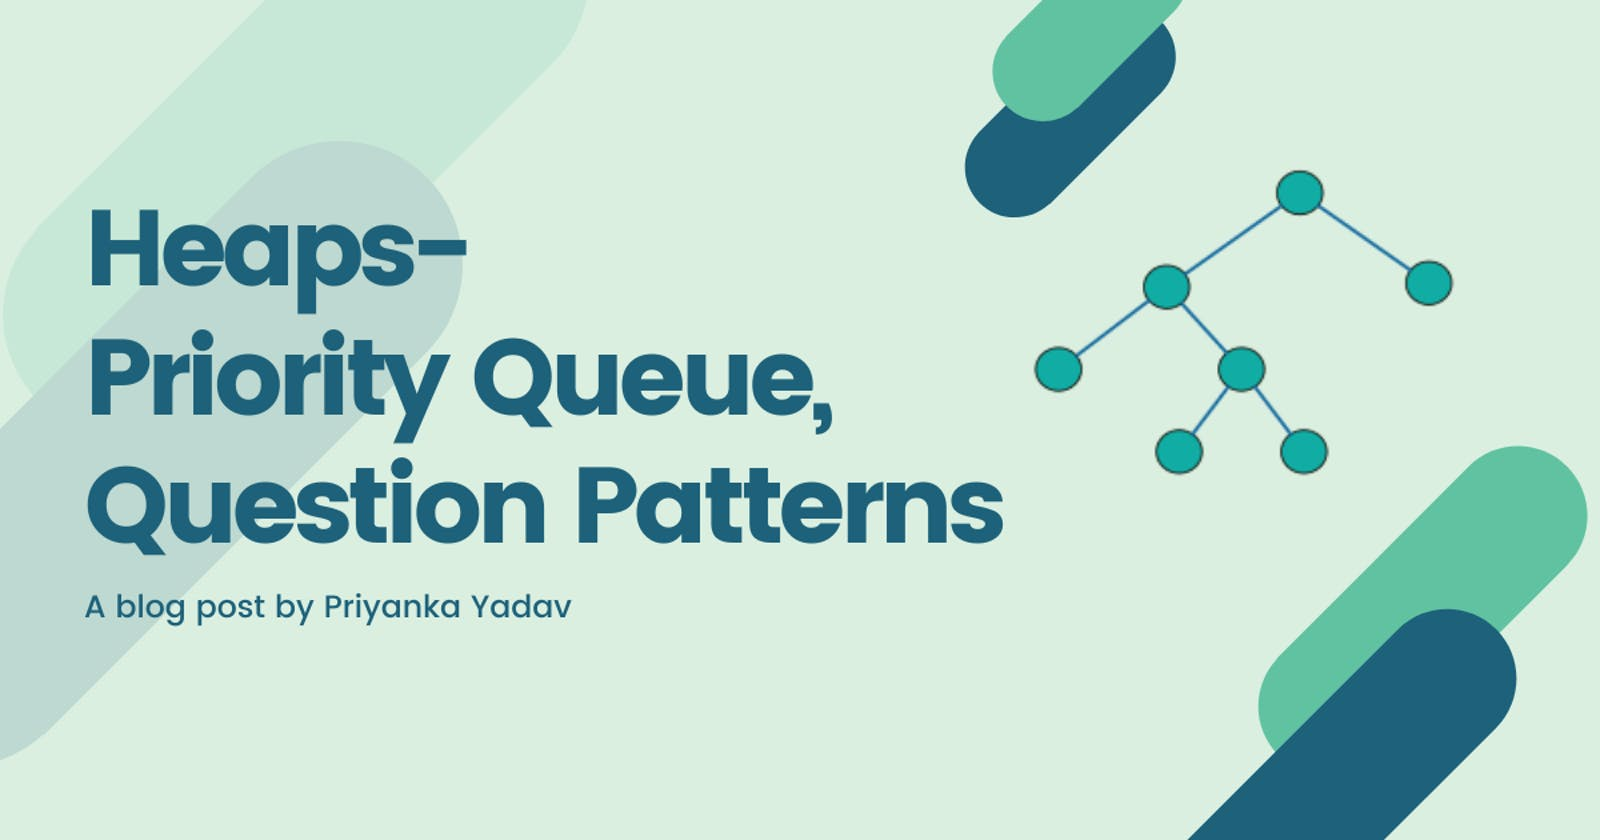 Heap - Priority Queue Implementation, Question Patterns